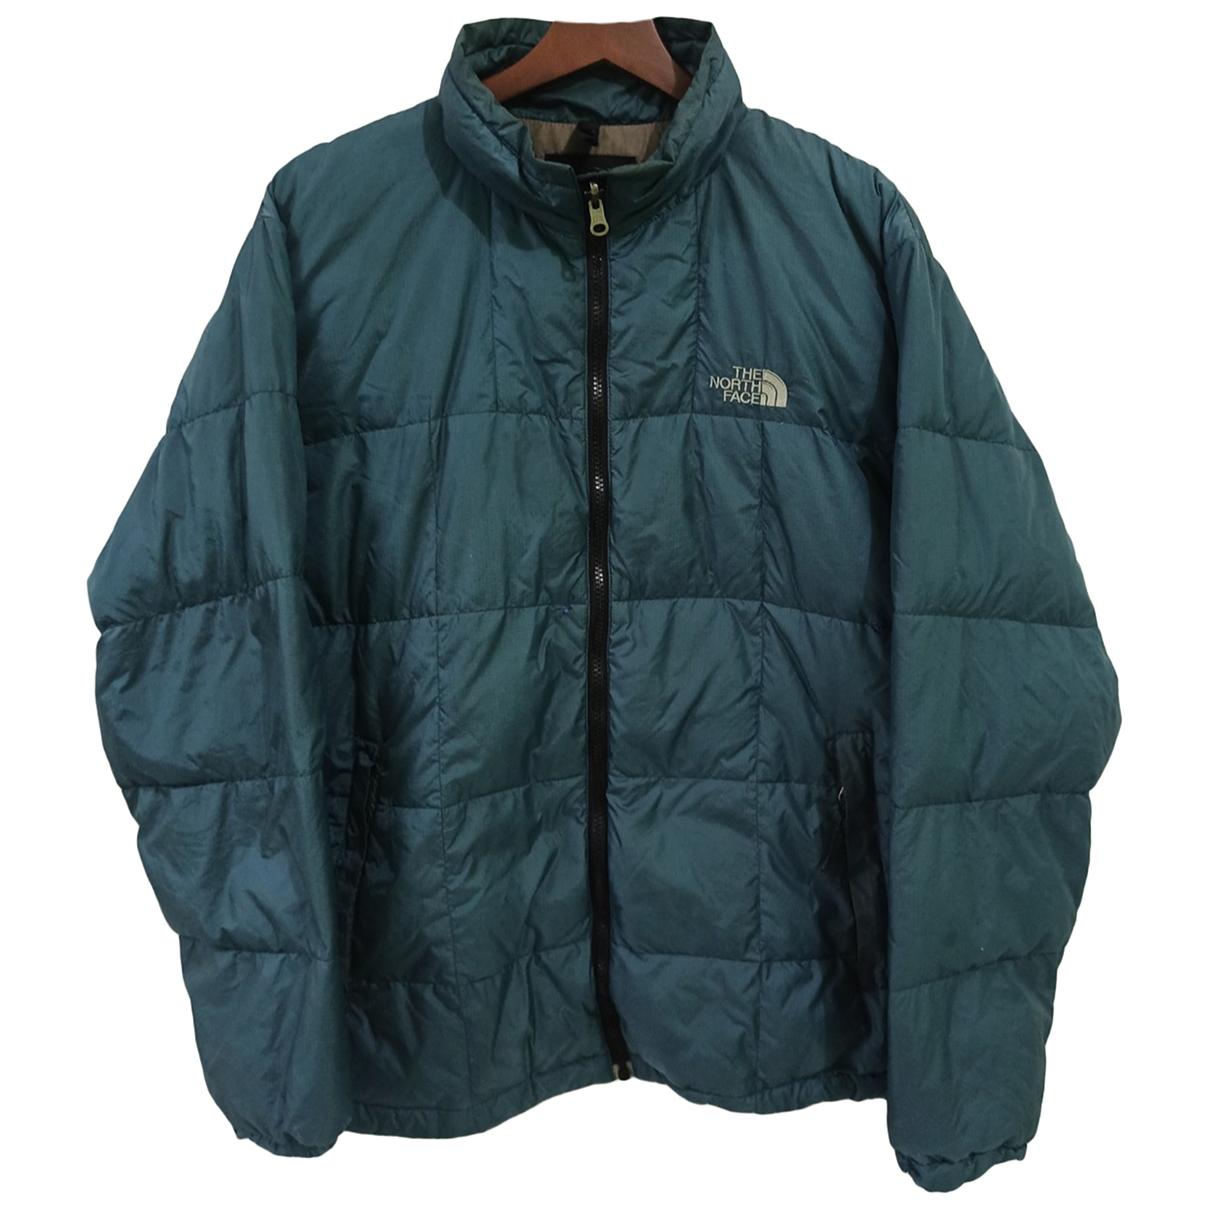 The North Face \N Green coat  for Men L International